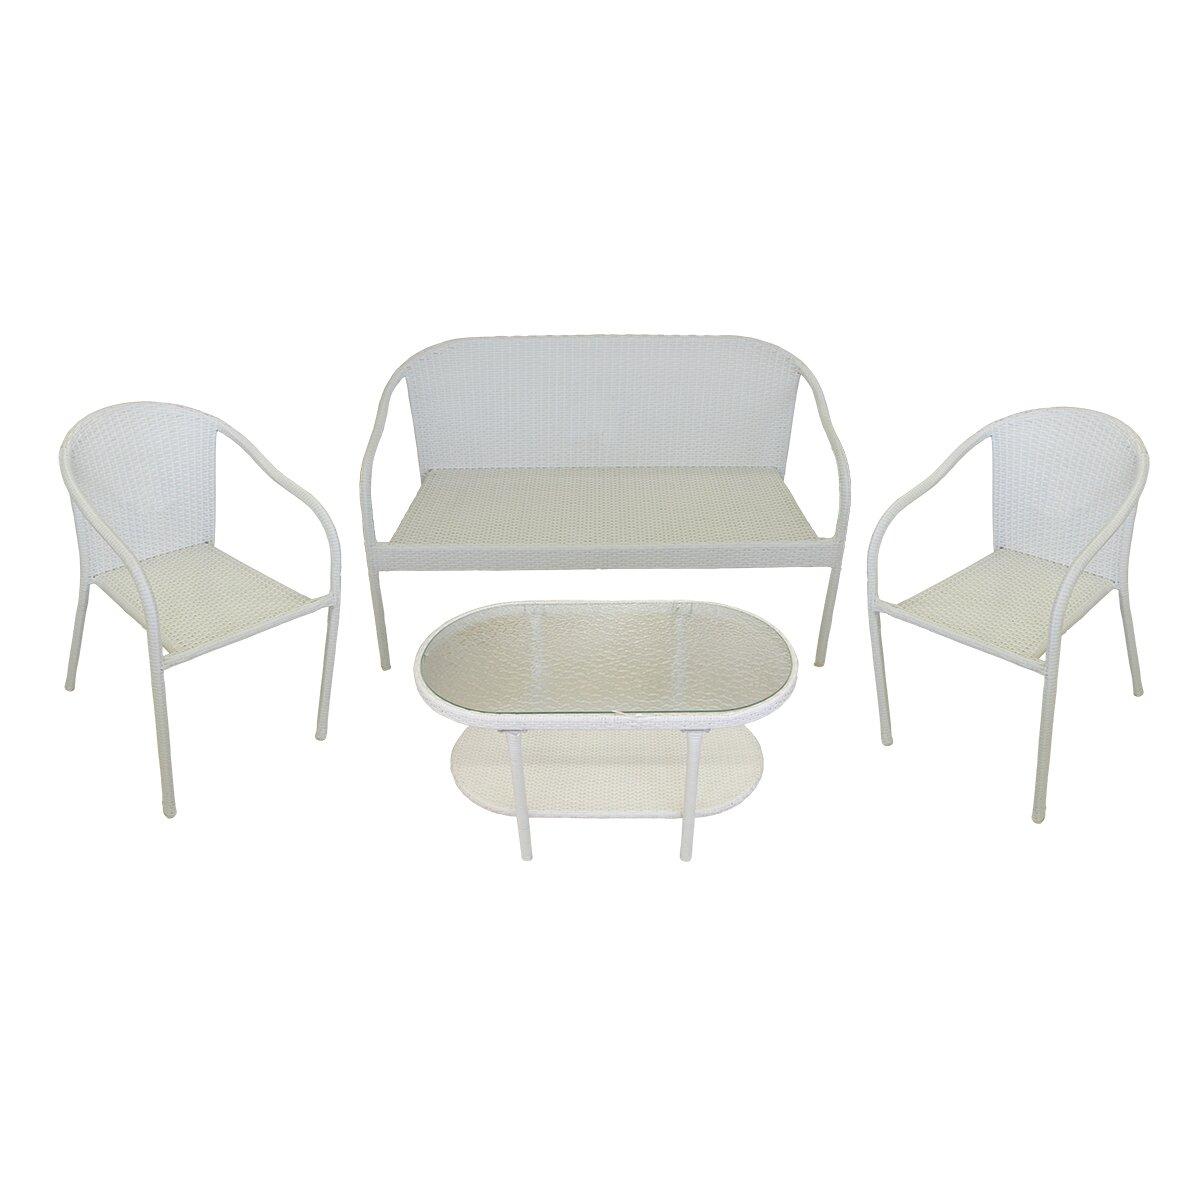 Resin Wicker Patio Furniture Sets: LB International 4 Piece Resin Wicker Patio Furniture Set